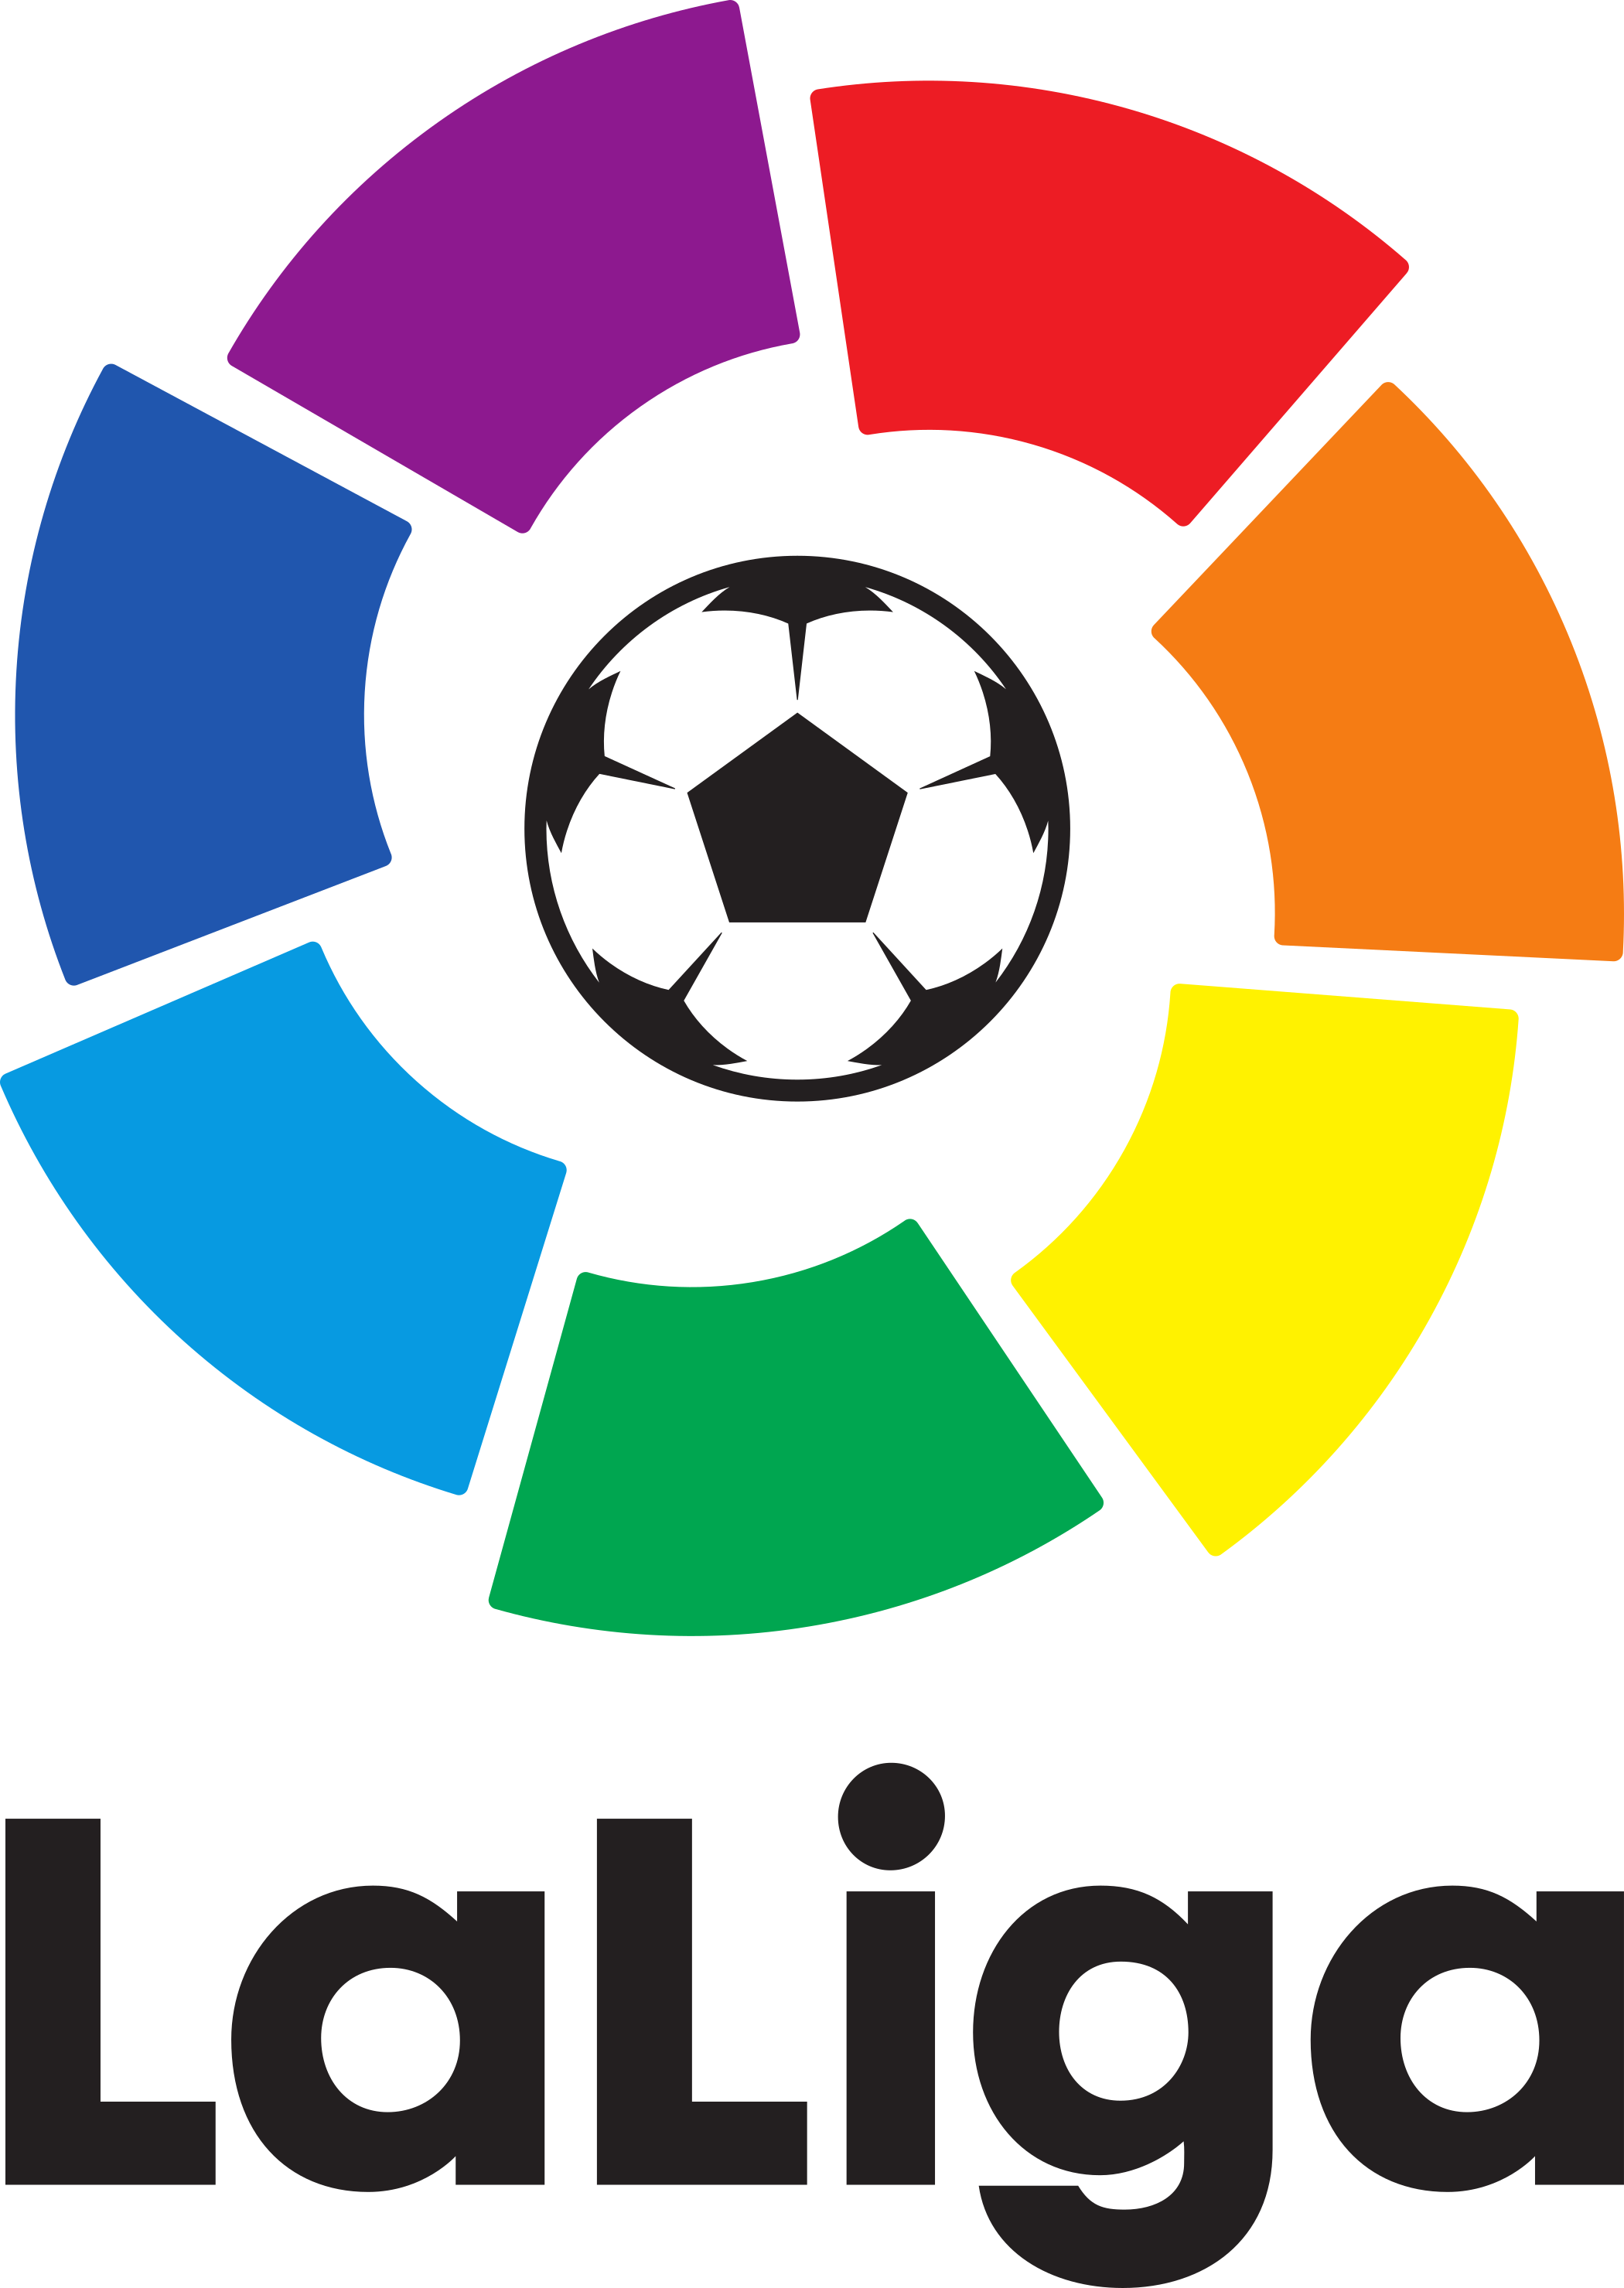 laliga logo 2 - LaLiga Logo – Campeonato Español de Fútbol